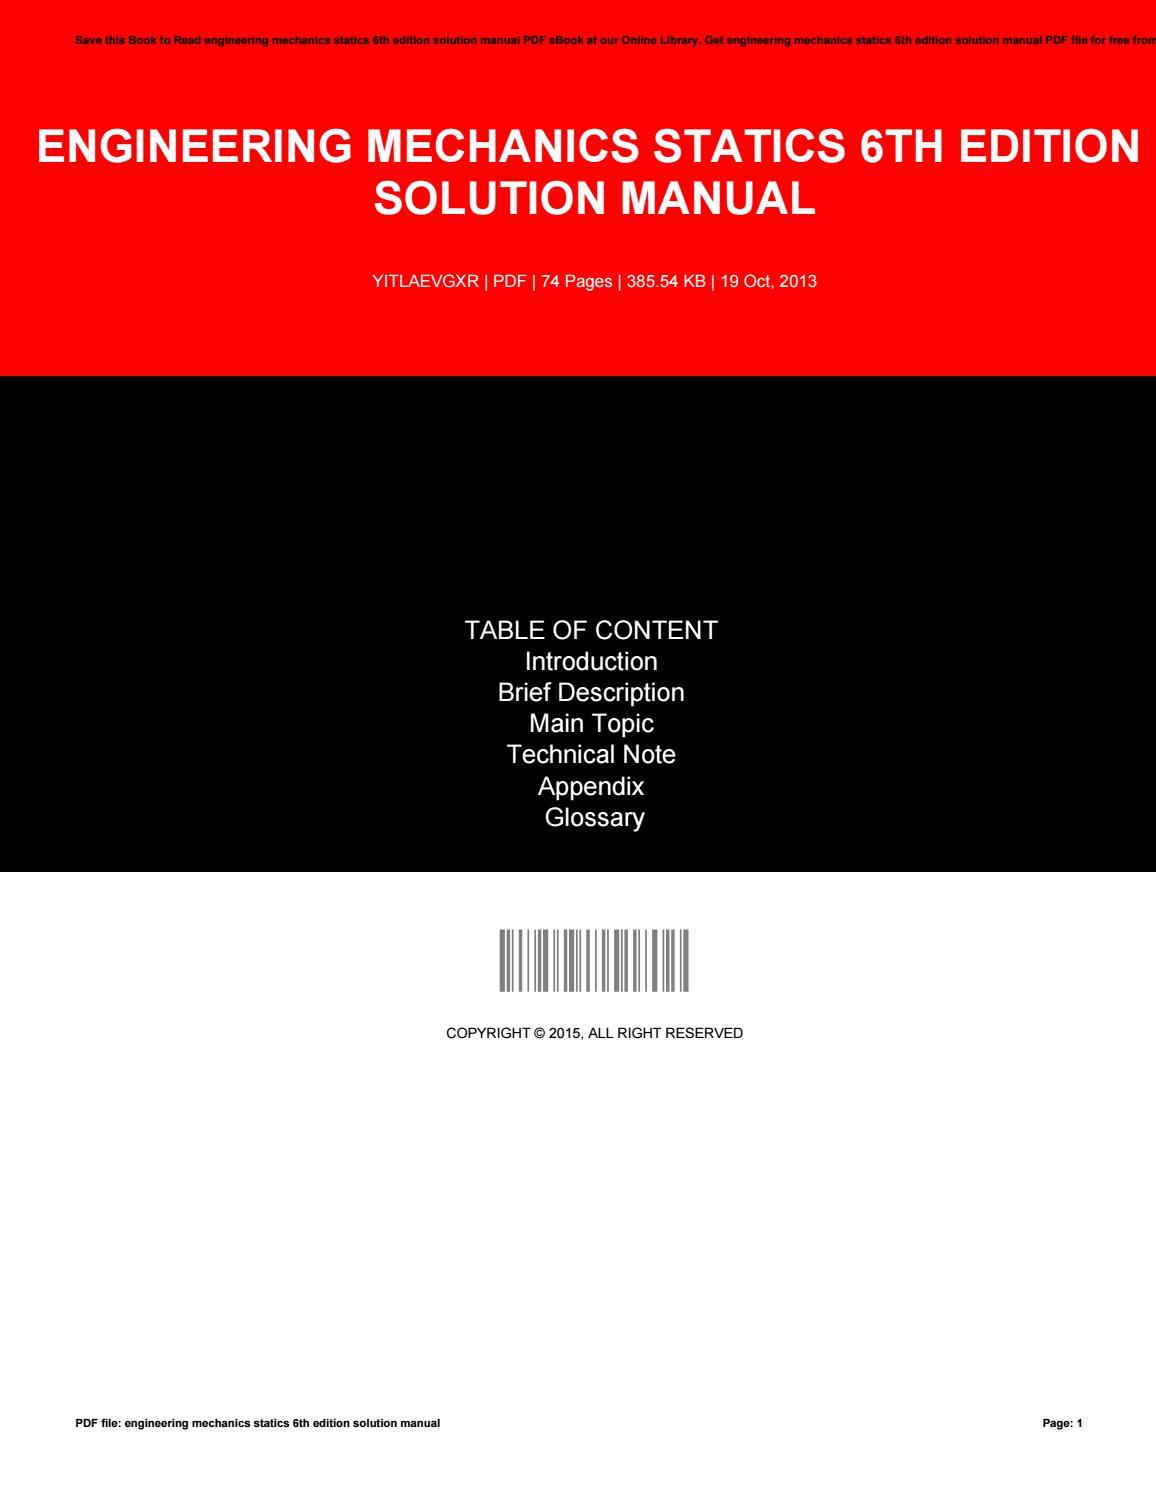 Engineering Mechanics Statics 6th Edition Solution Manual By